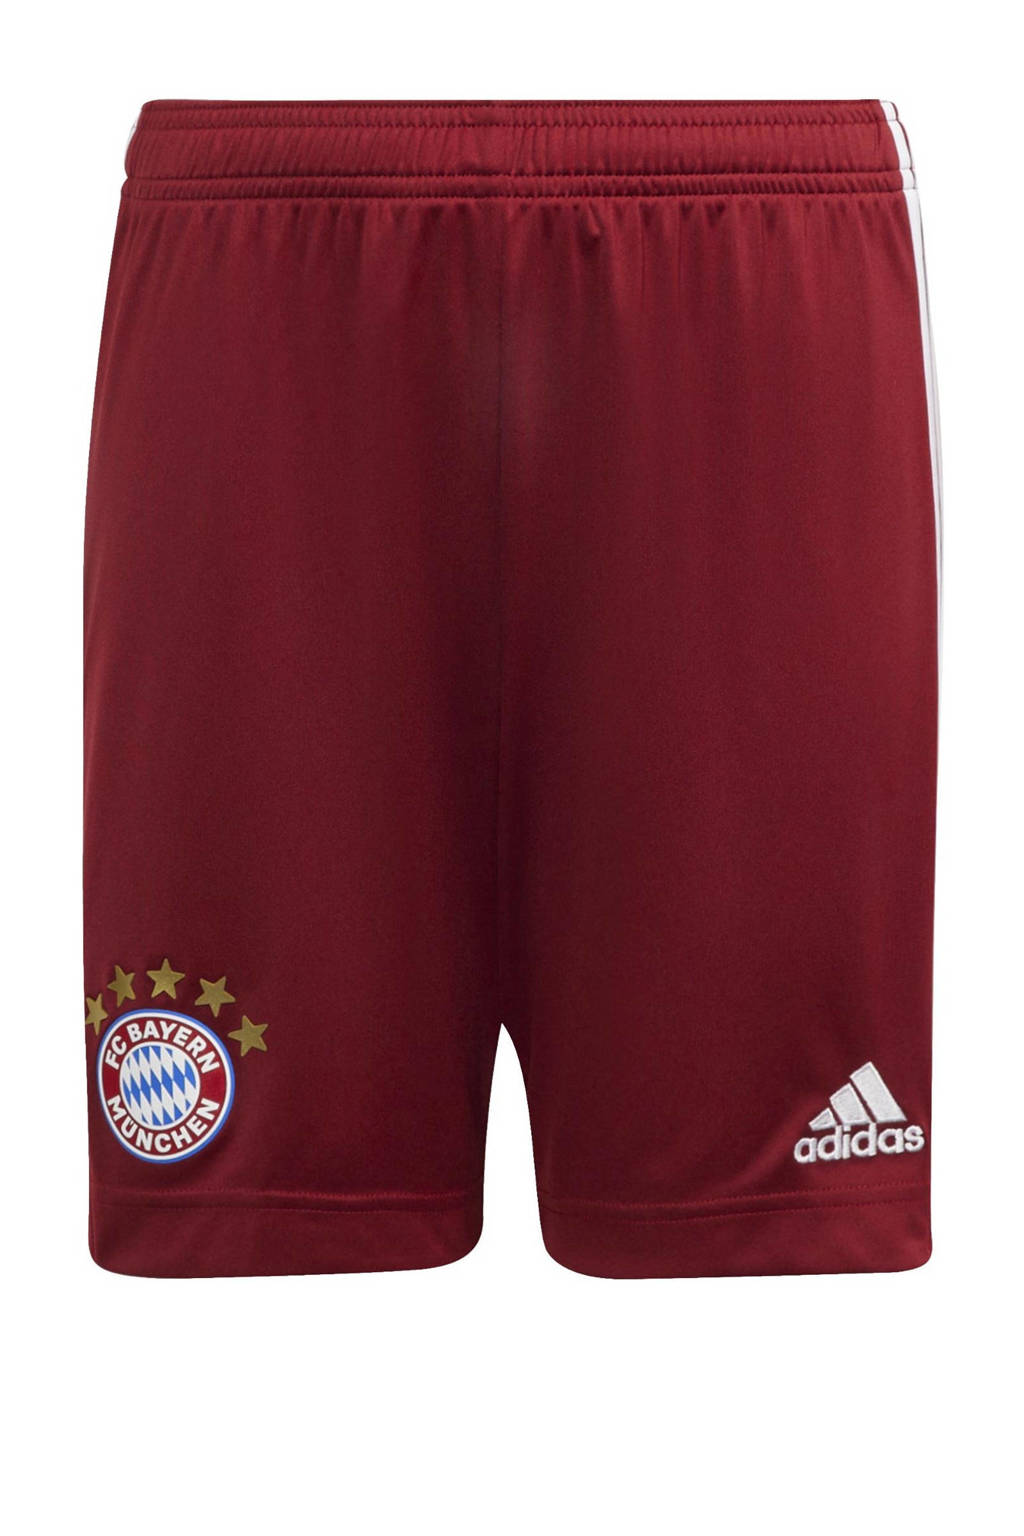 adidas Performance Junior FC Bayern München voetbalshort thuis, Rood